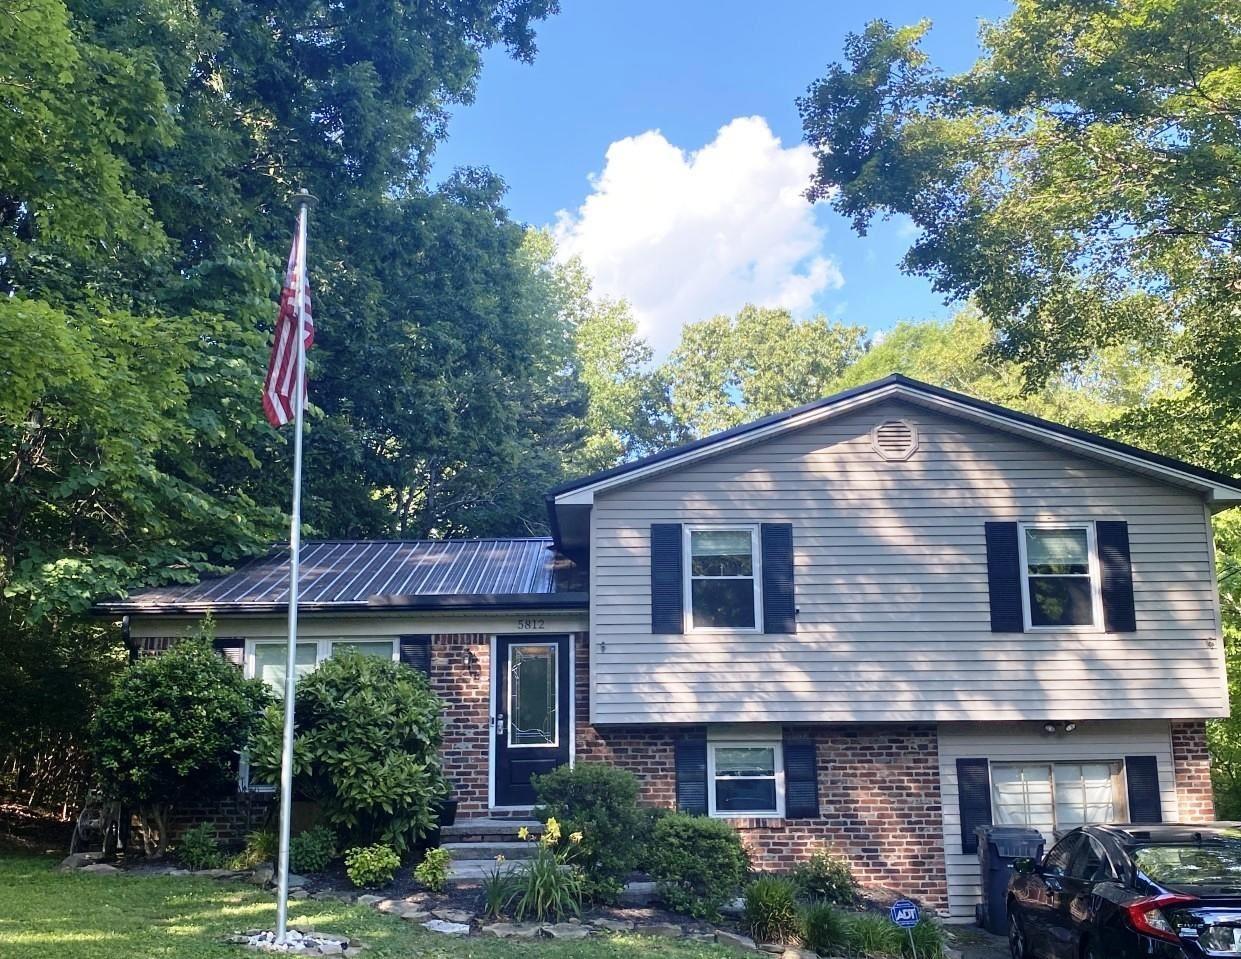 Photo of 5812 Ridgewood Rd, Knoxville, TN 37918 (MLS # 1156897)